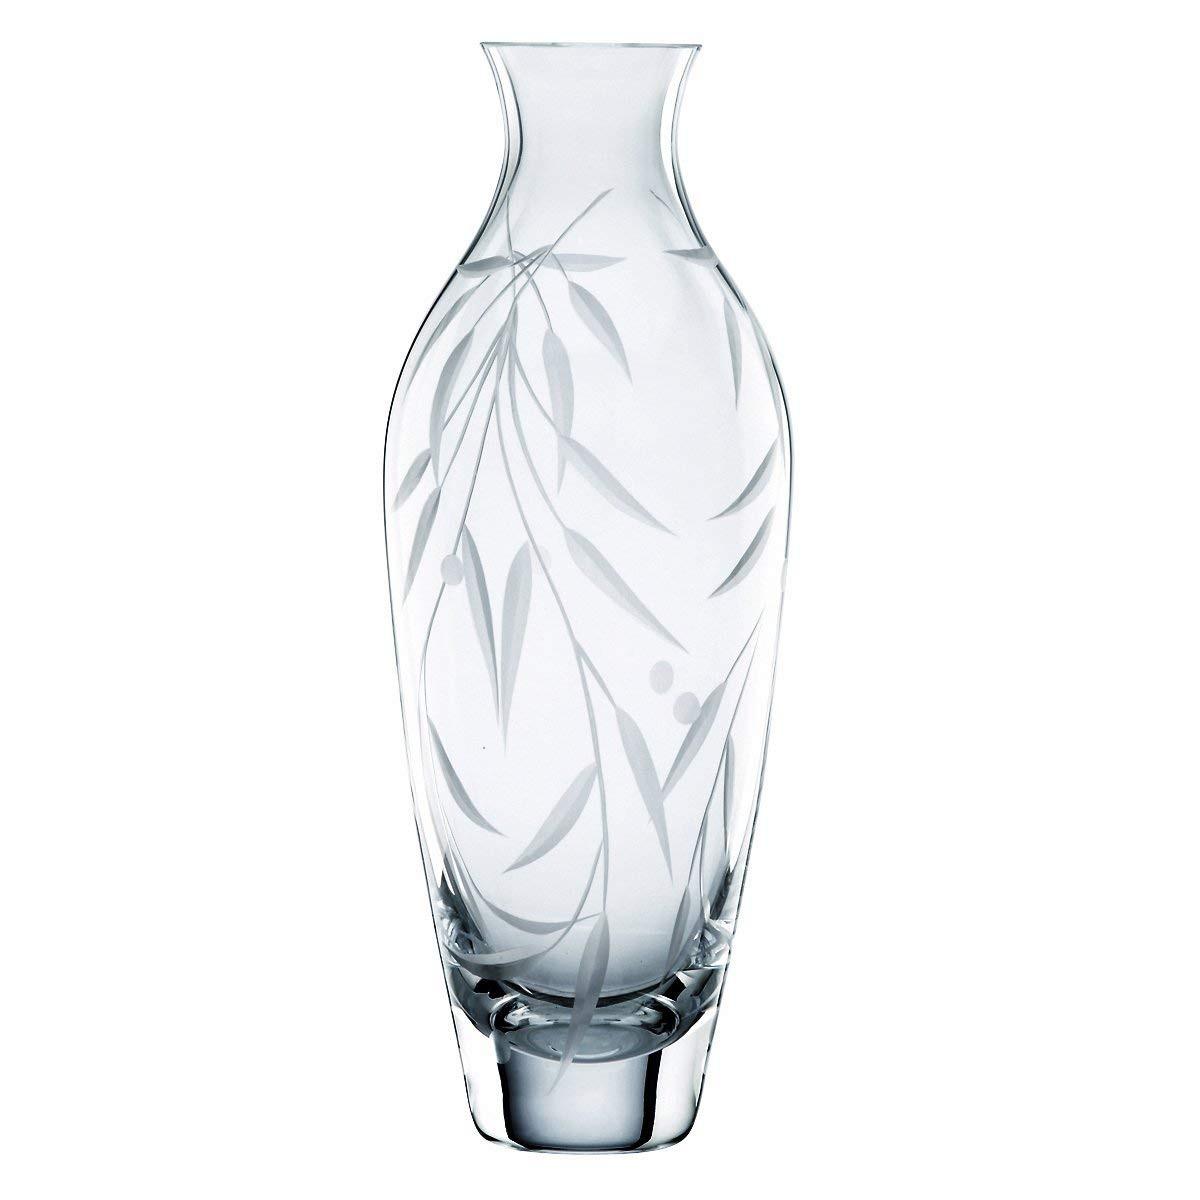 waterford giftology lismore sugar bud vase of amazon com lenox opal innocence crystal bud vase home kitchen with regard to 610apullewl sl1200